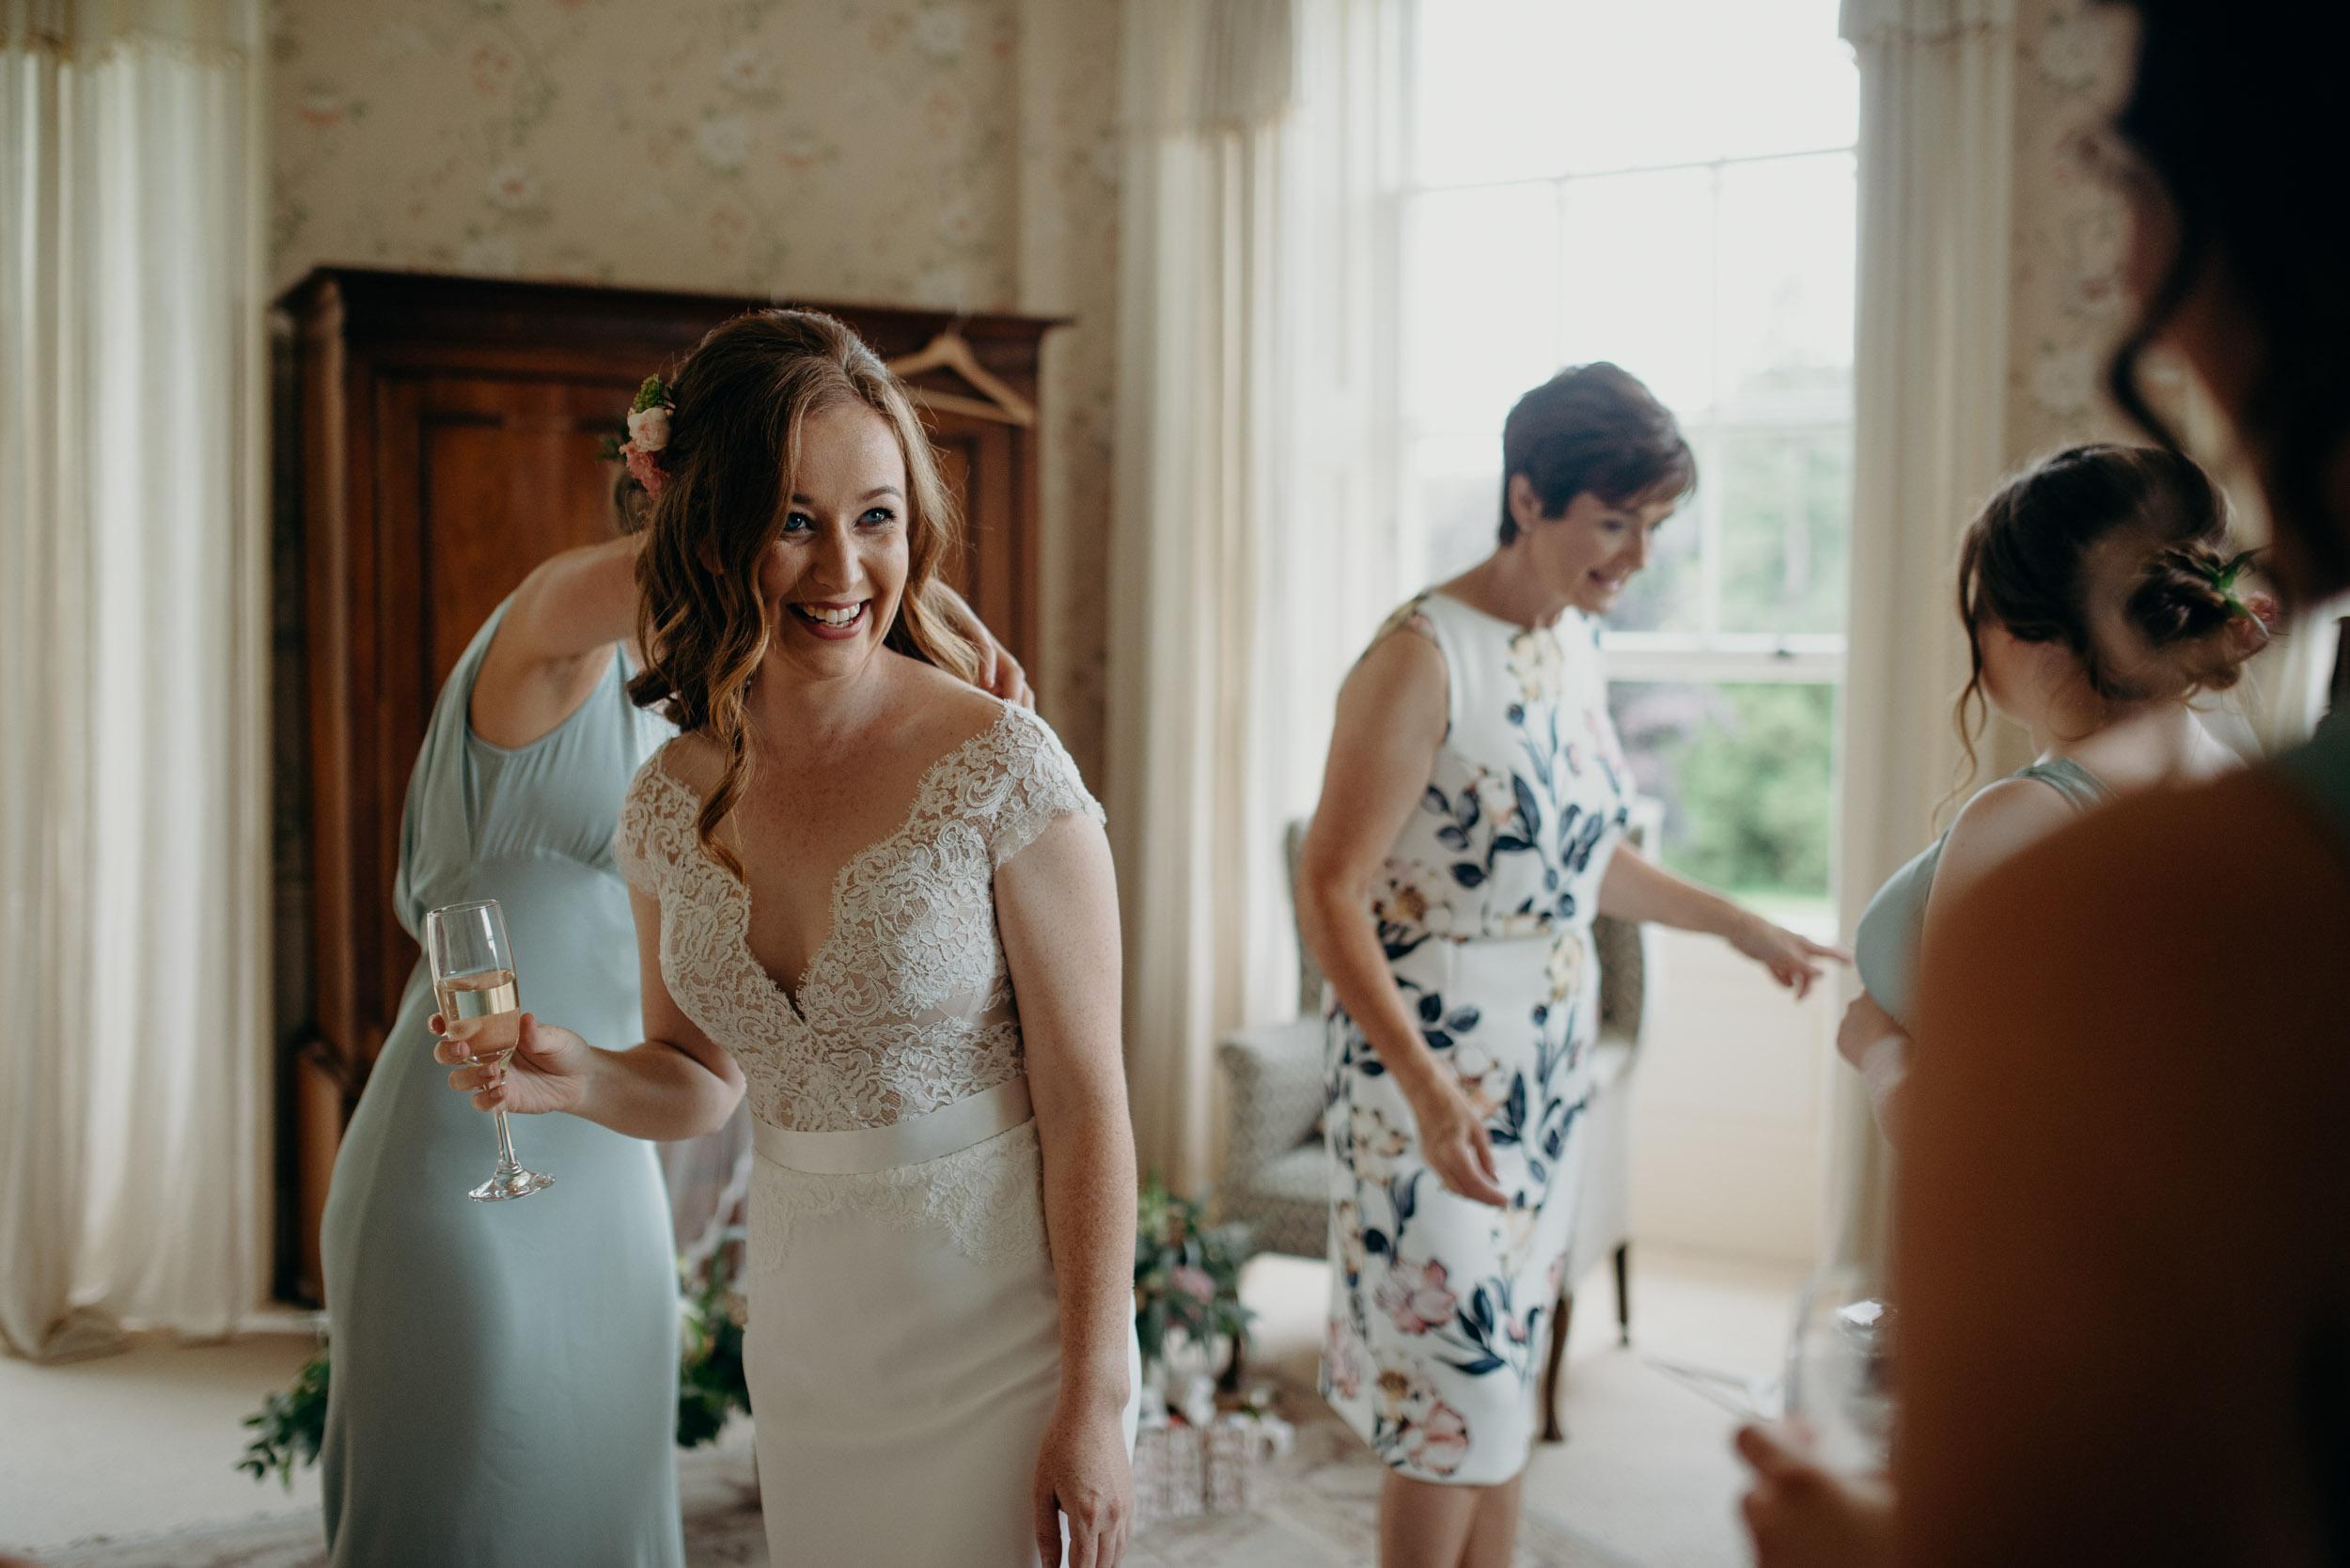 drenagh estate wedding photography-21.jpg